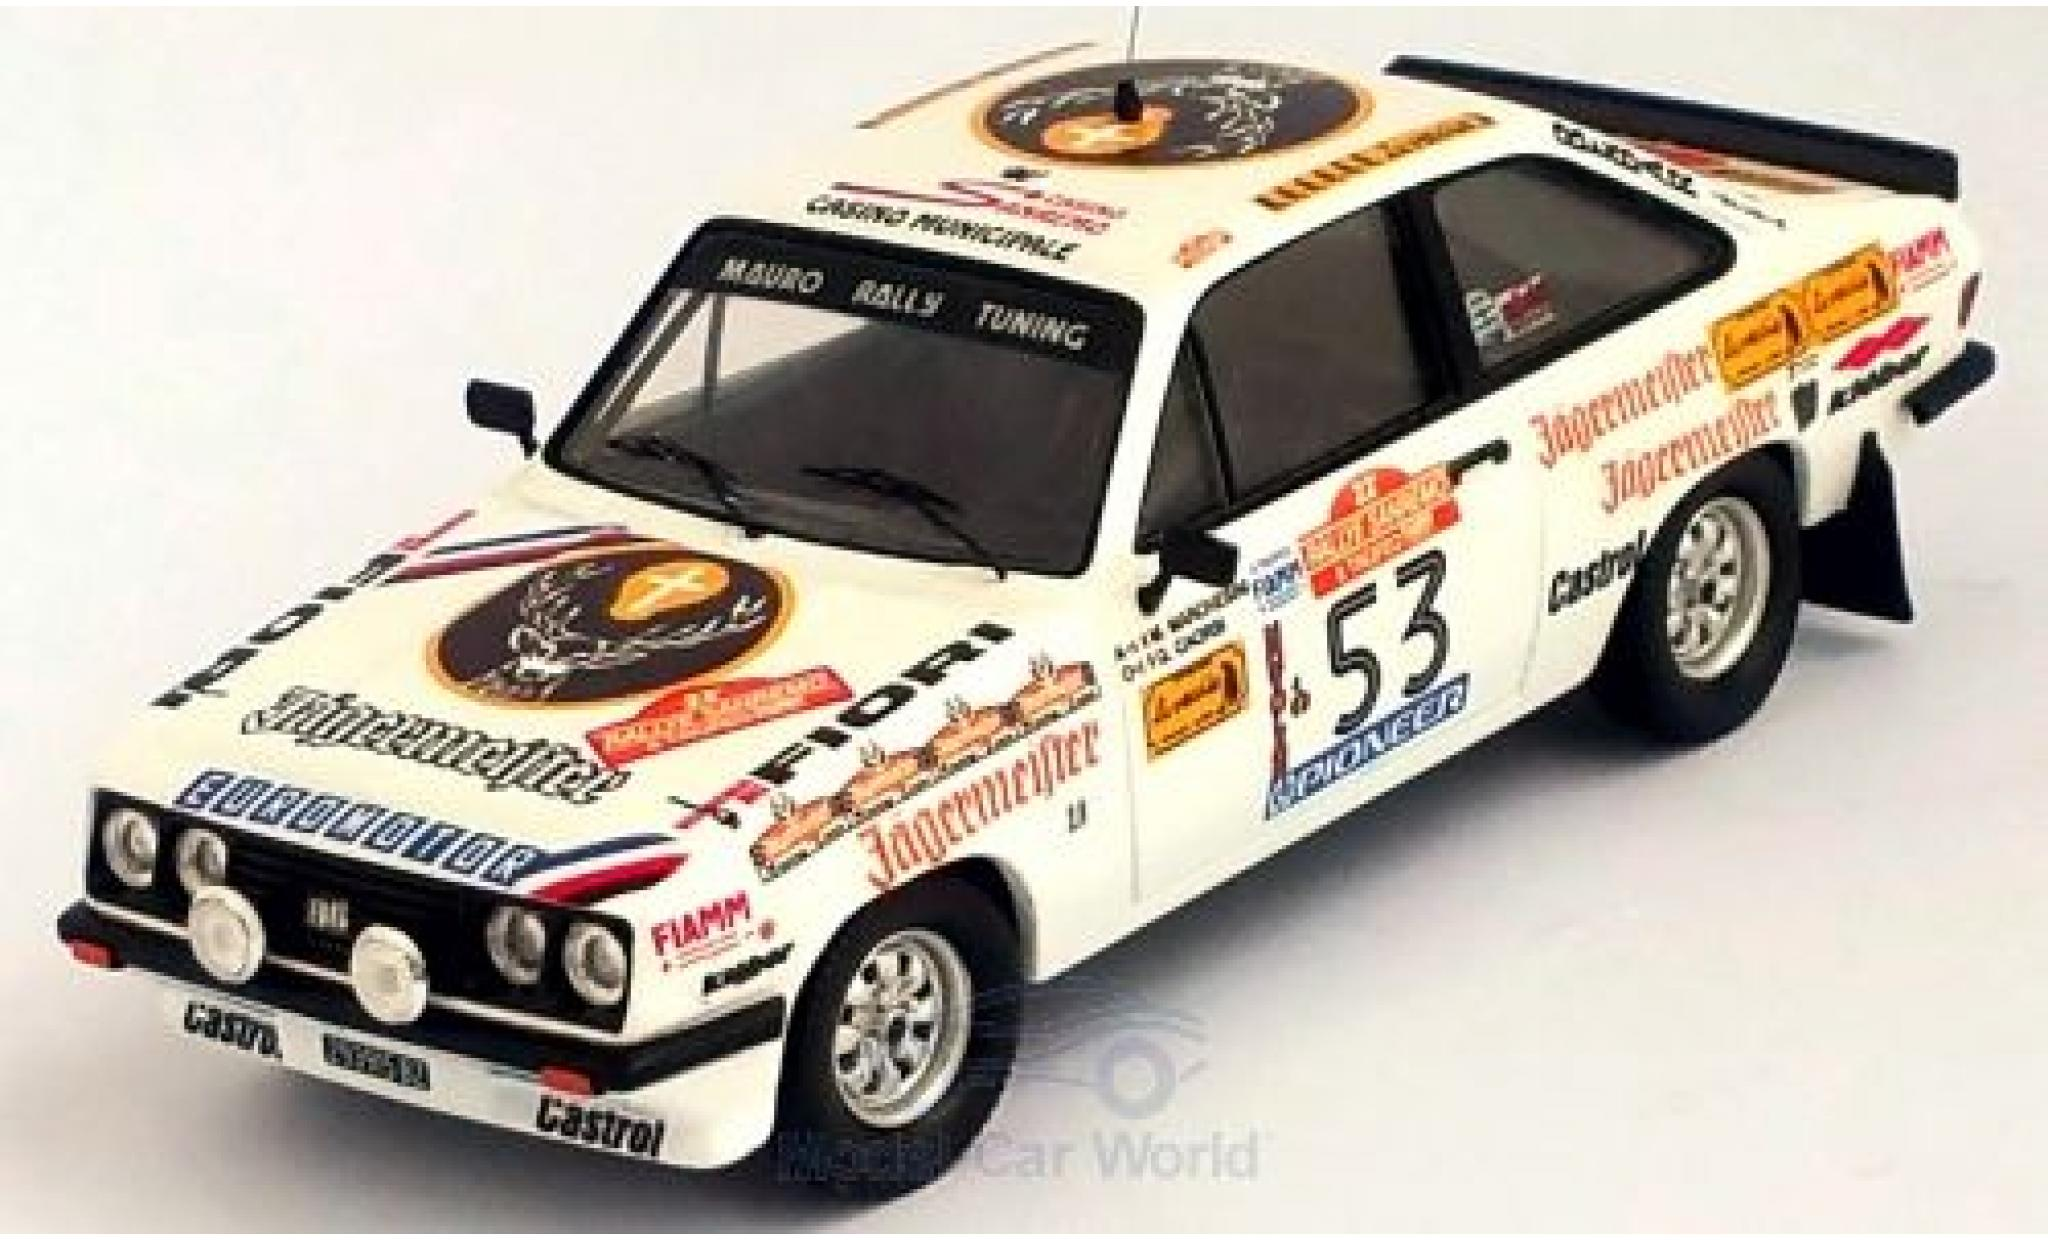 Ford Escort 1/43 Trofeu MKII RS 2000 No.53 Rallye WM Rally San Remo 1980 M.Marchesini/G.Caorsi